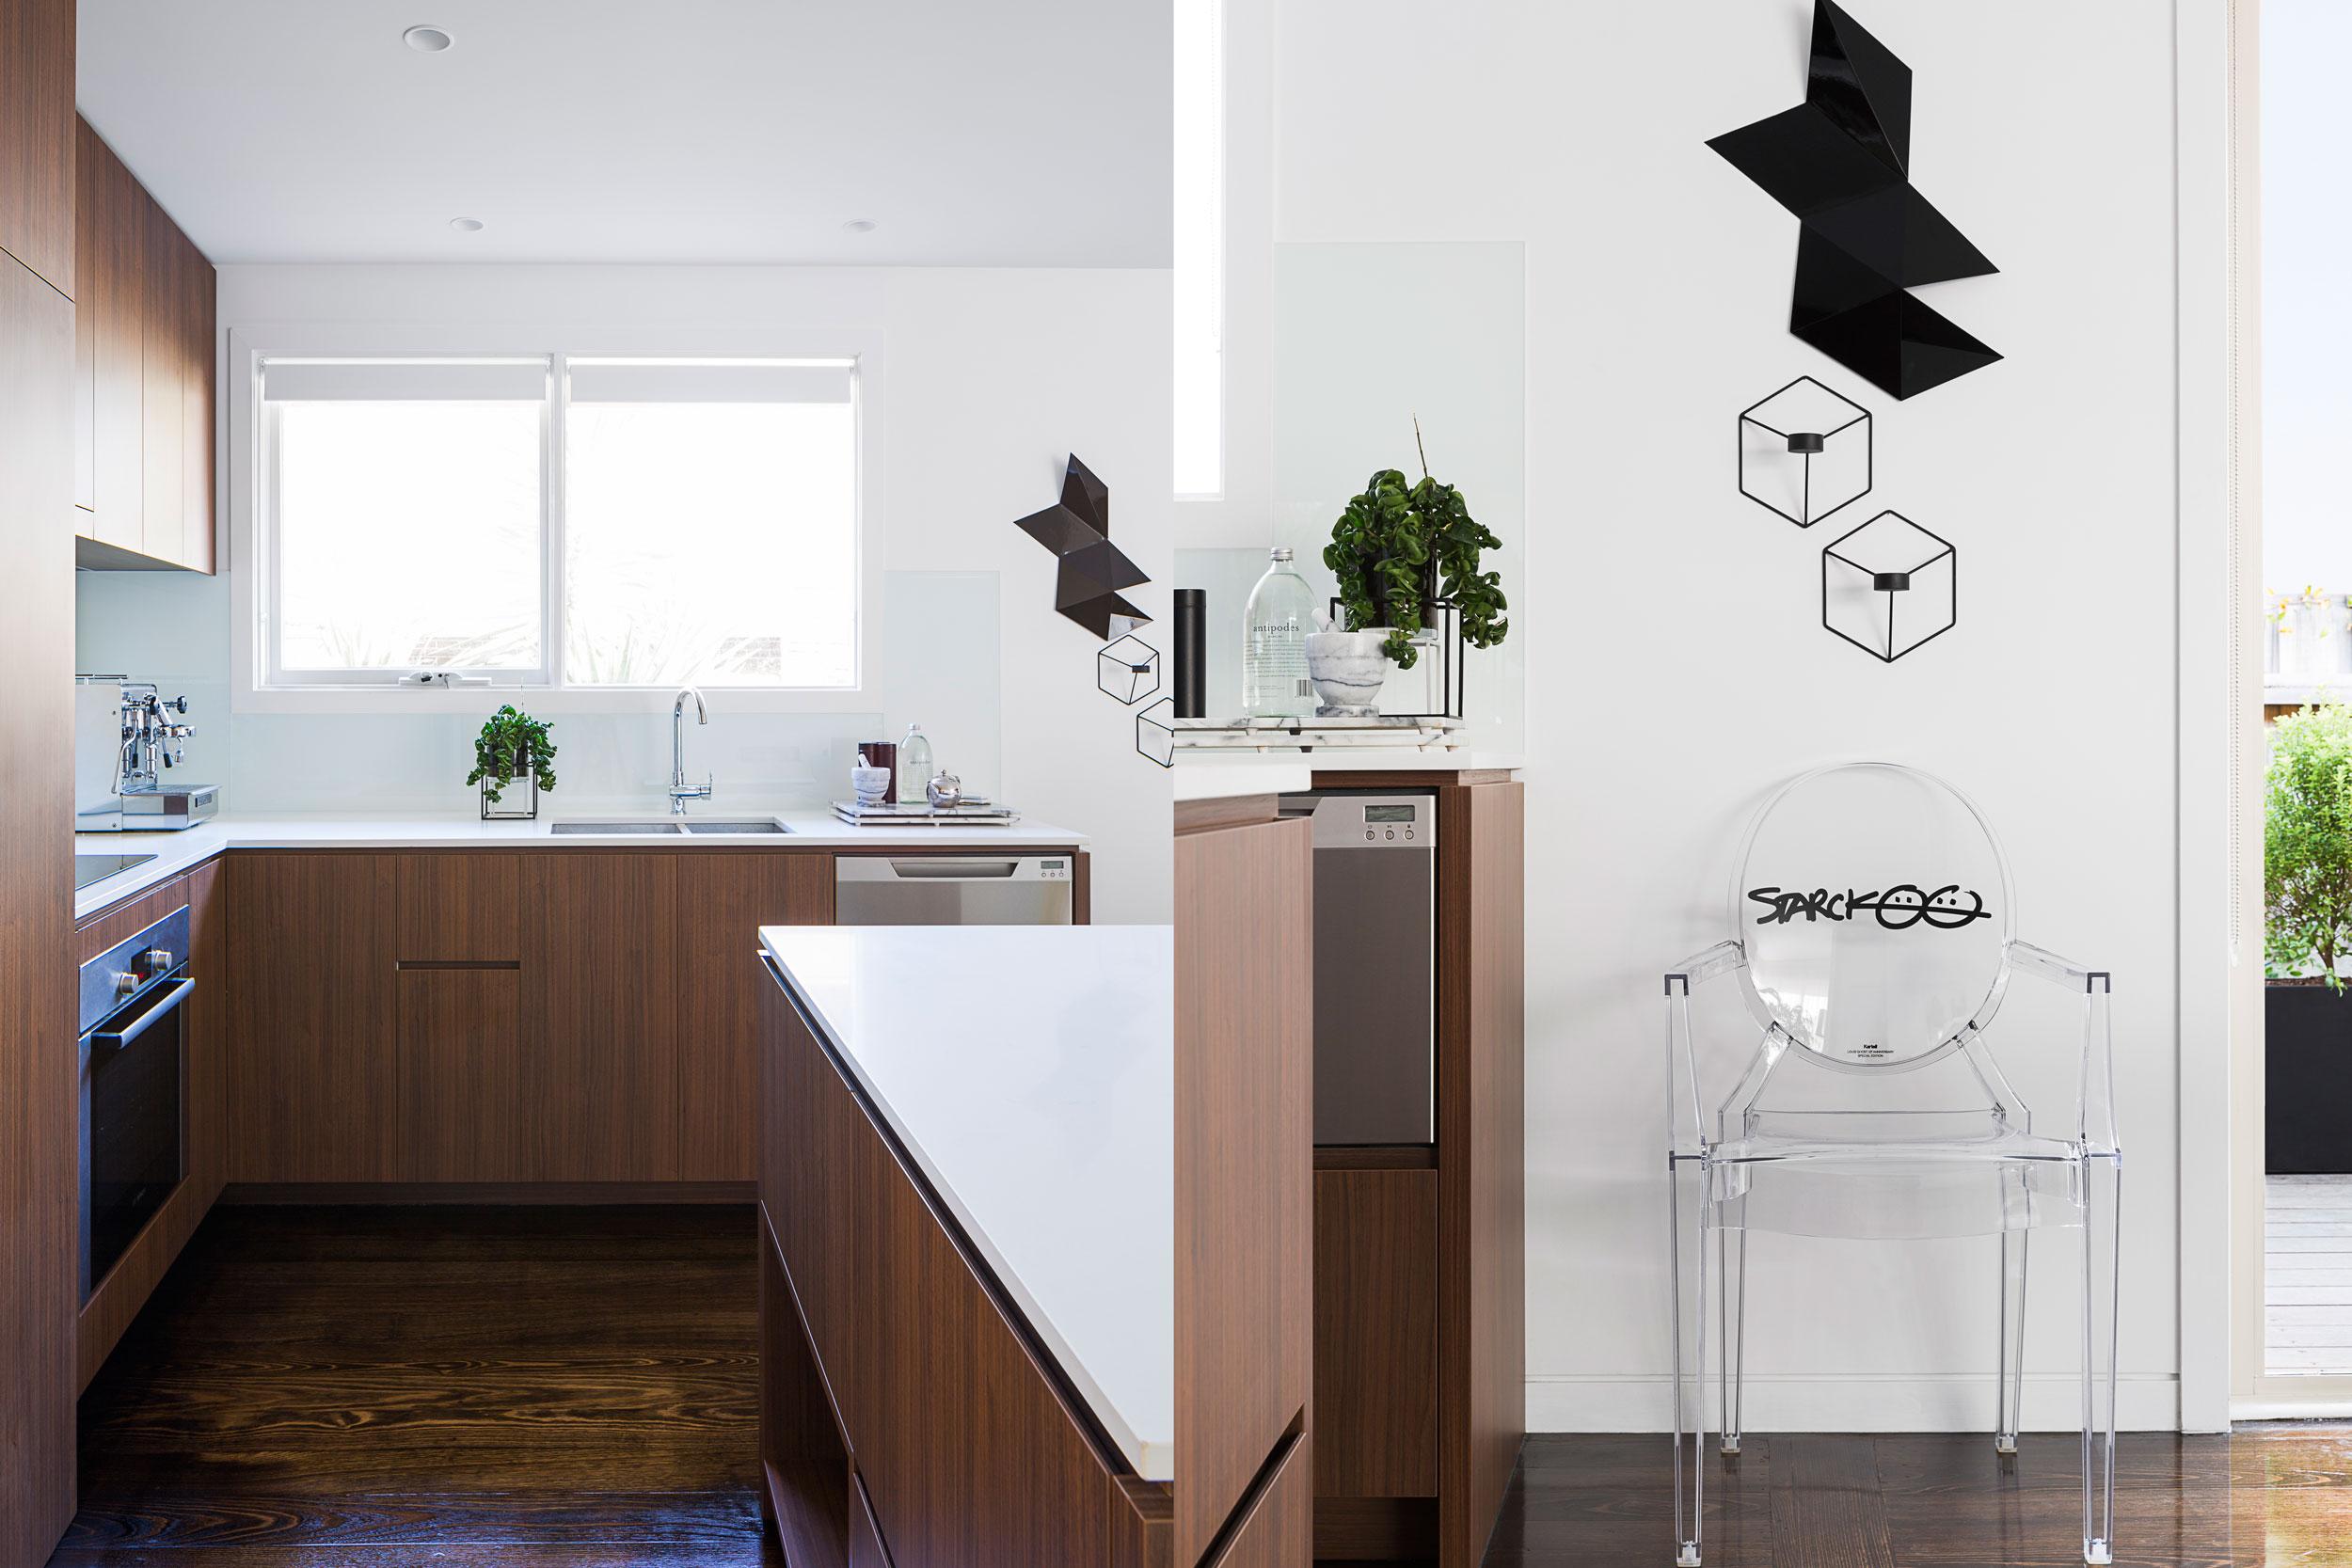 Sarah_Anderson_Photography_SWG_Studio_interior_Kitchen